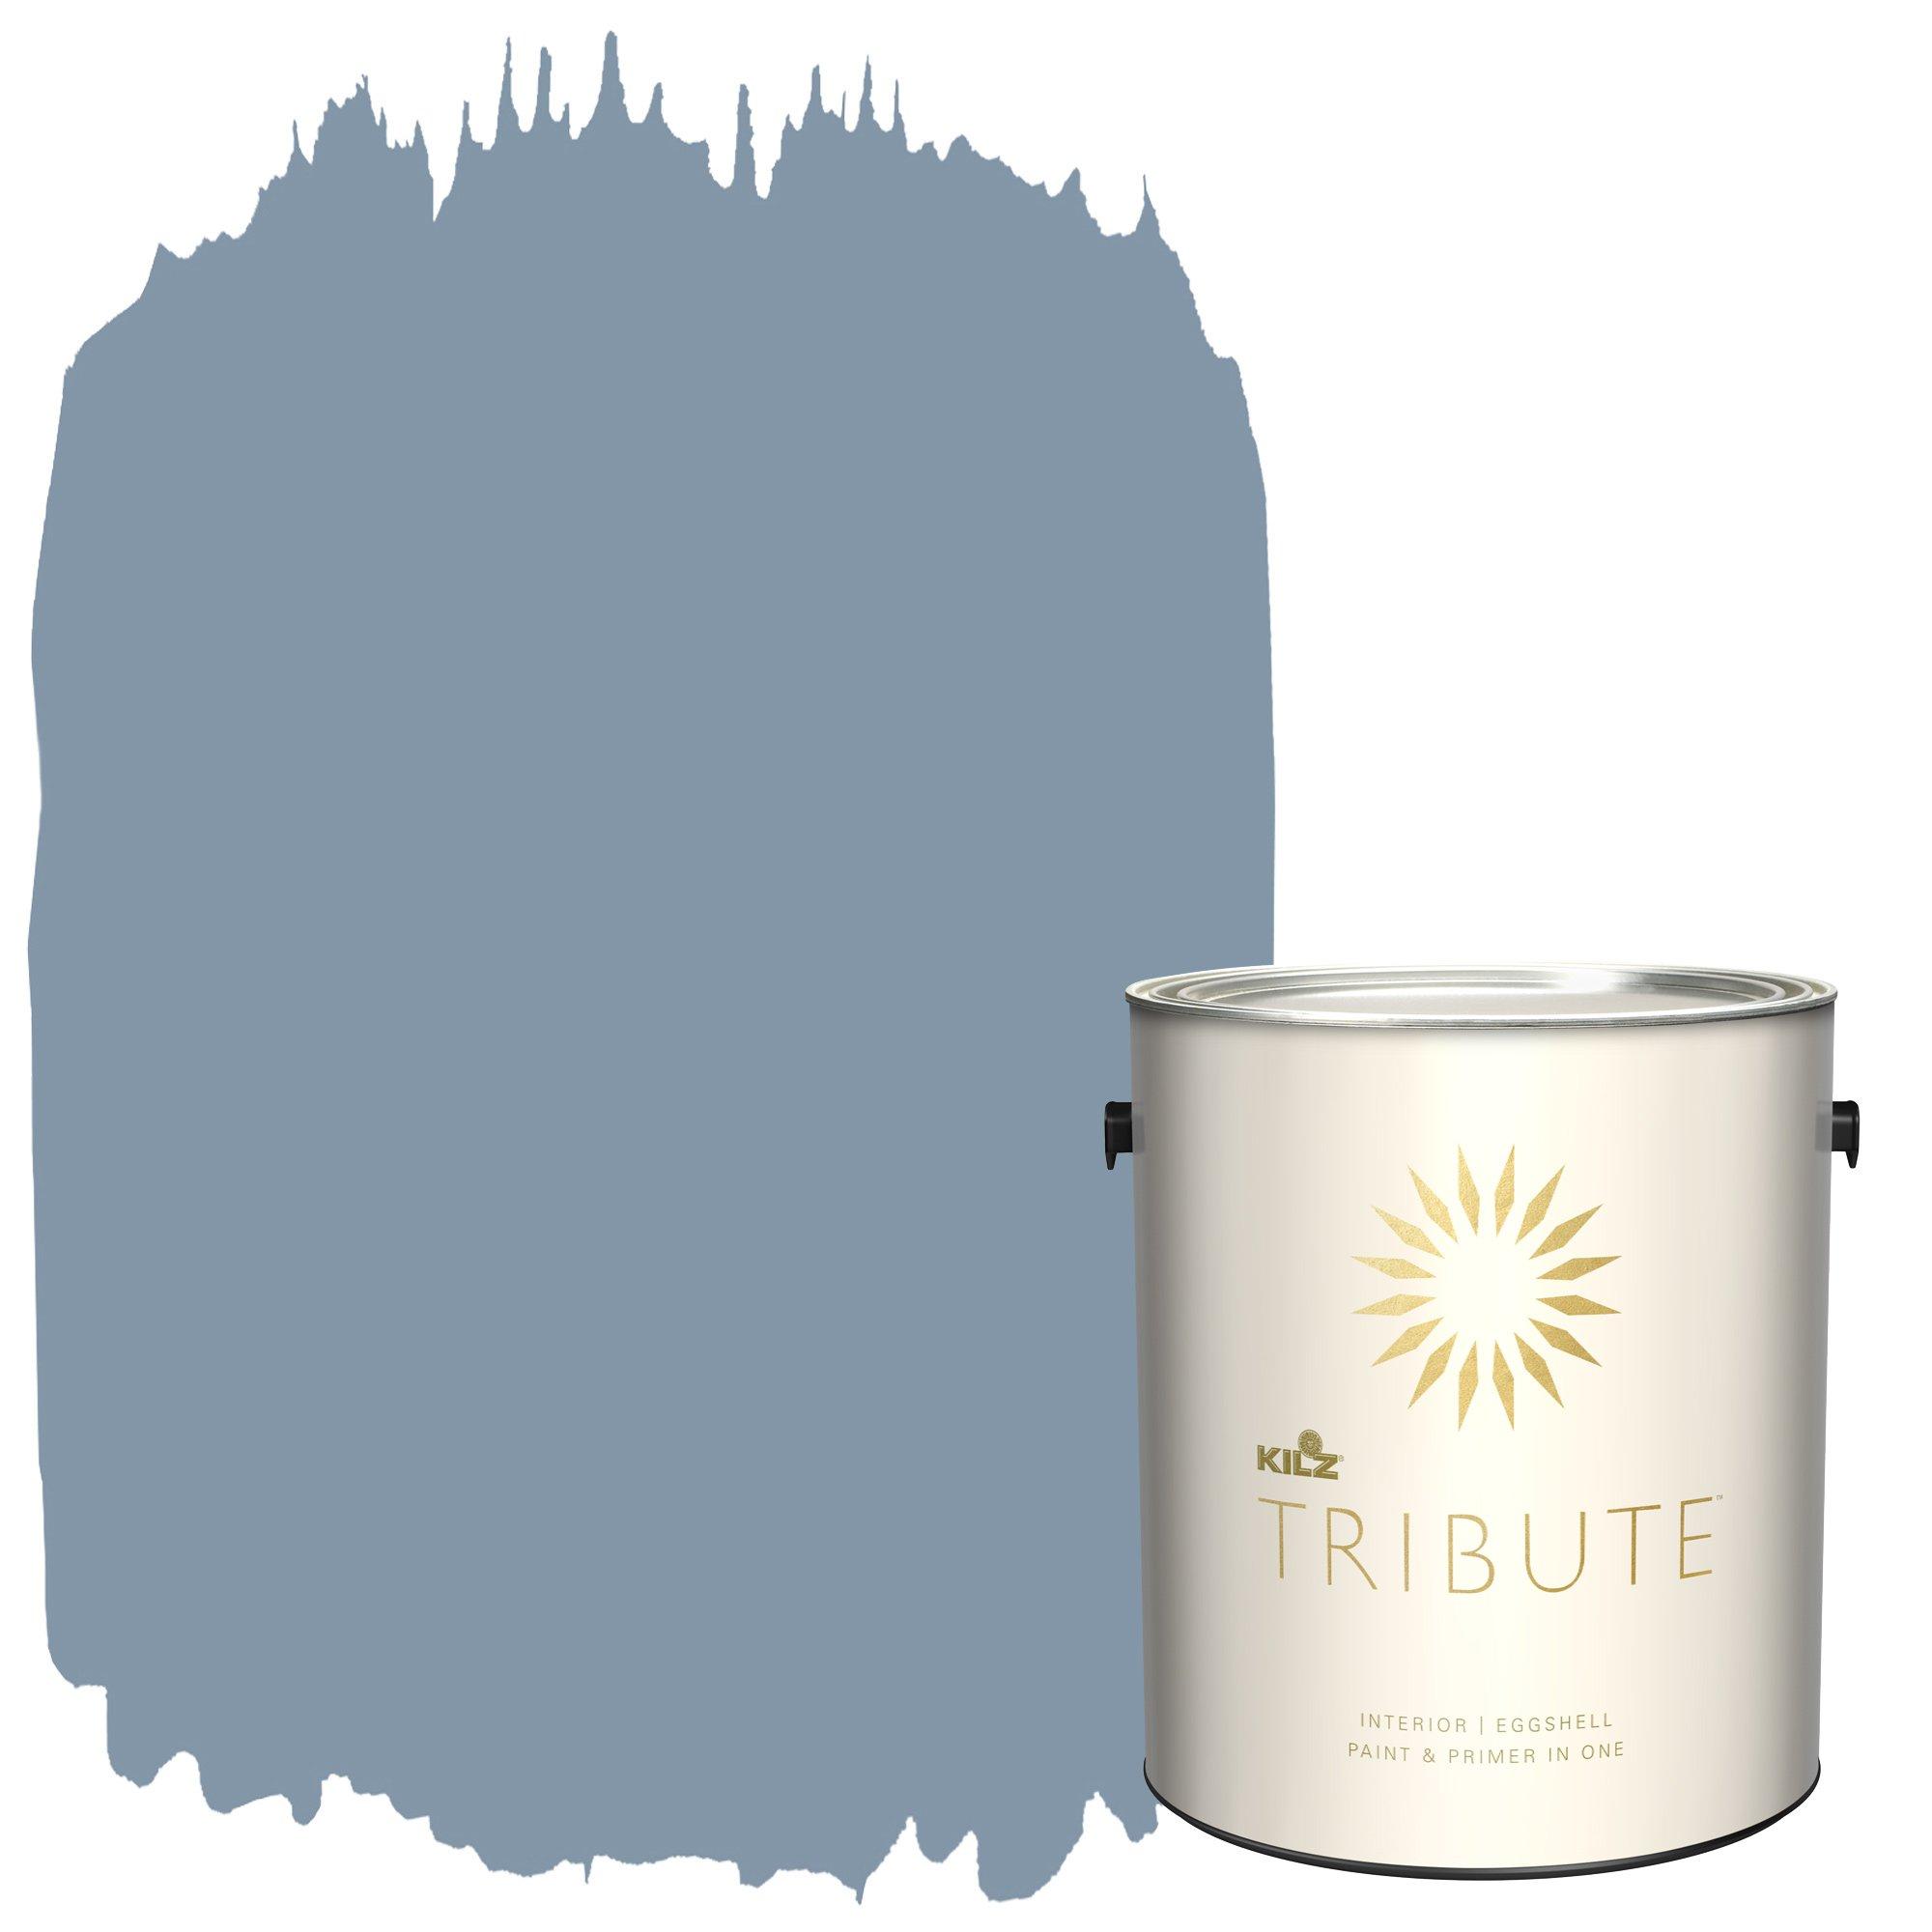 KILZ TRIBUTE Interior Eggshell Paint and Primer in One, 1 Gallon, Vintage Indigo (TB-48)